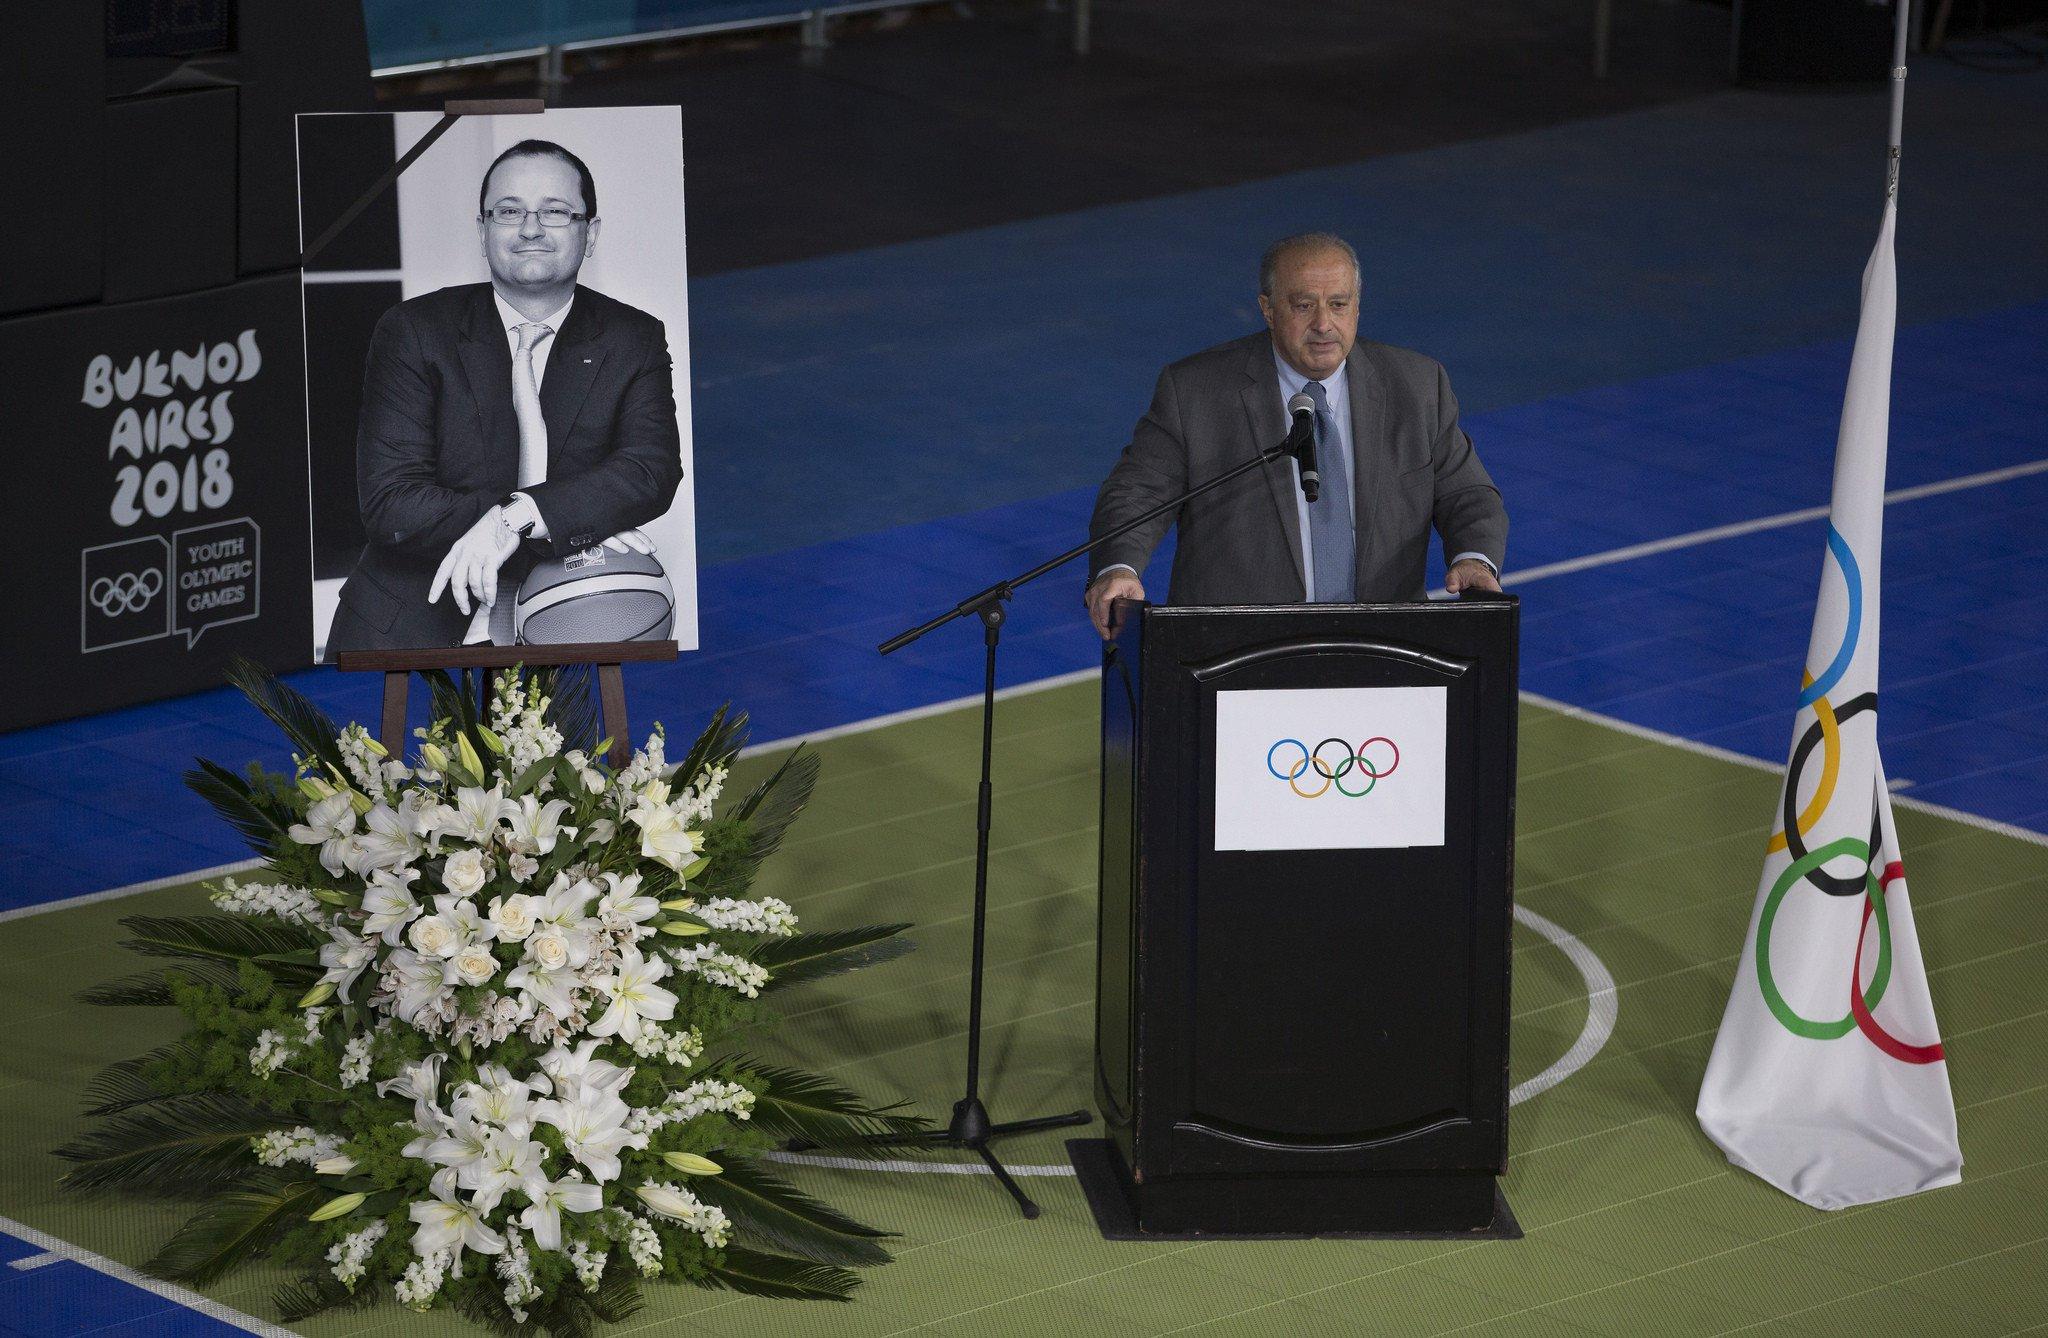 IOC President Bach pays emotional tribute to Baumann